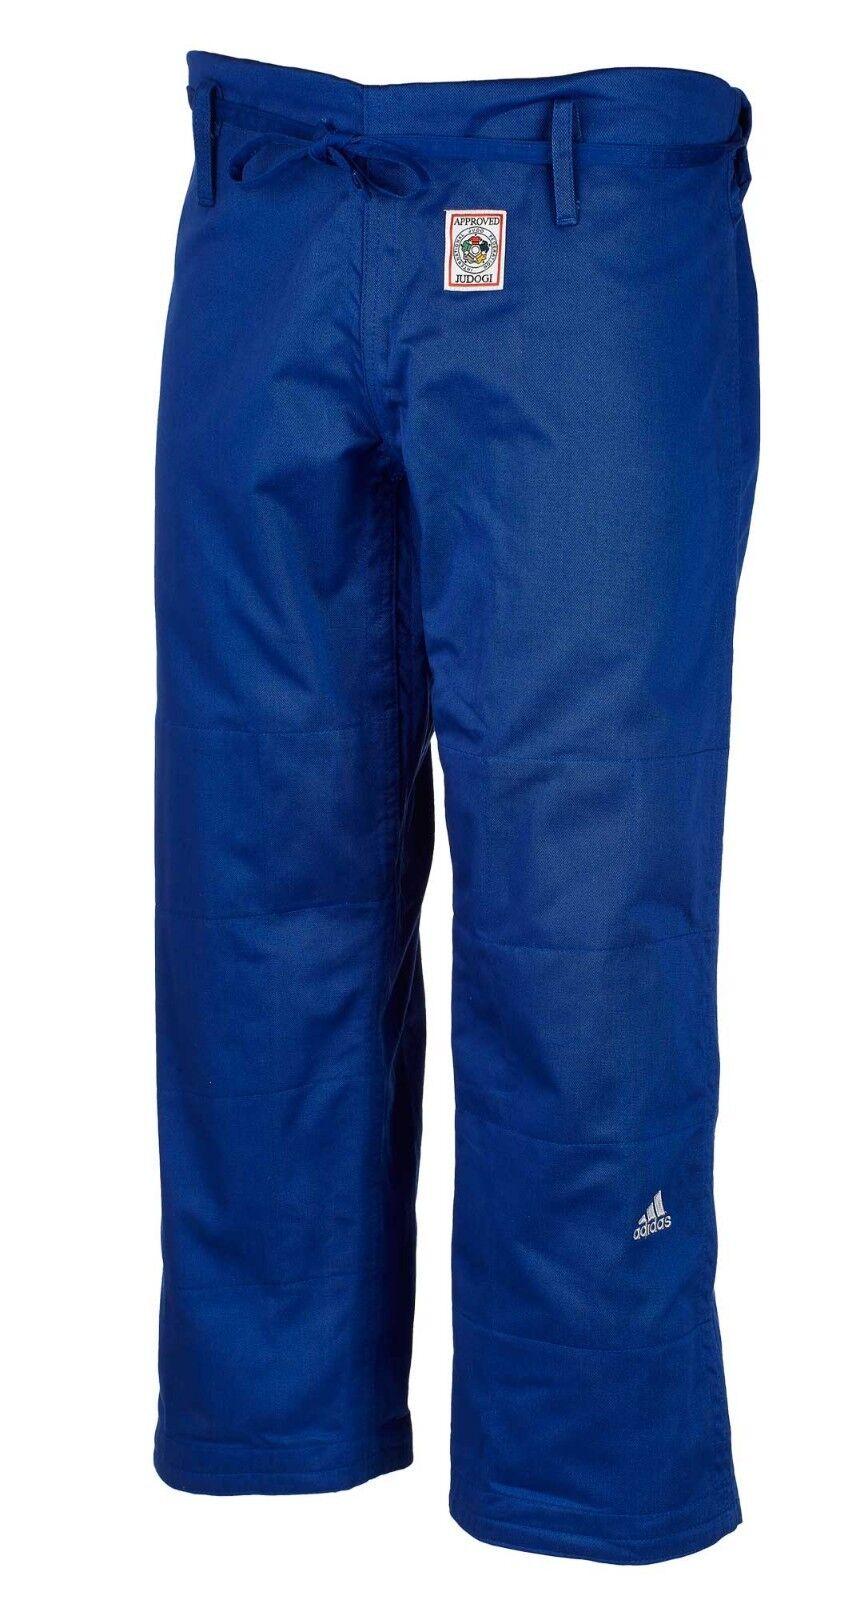 Adidas Judo Trousers  Champion II  IJF Blau jt275b-Judo-Trousers-Hose